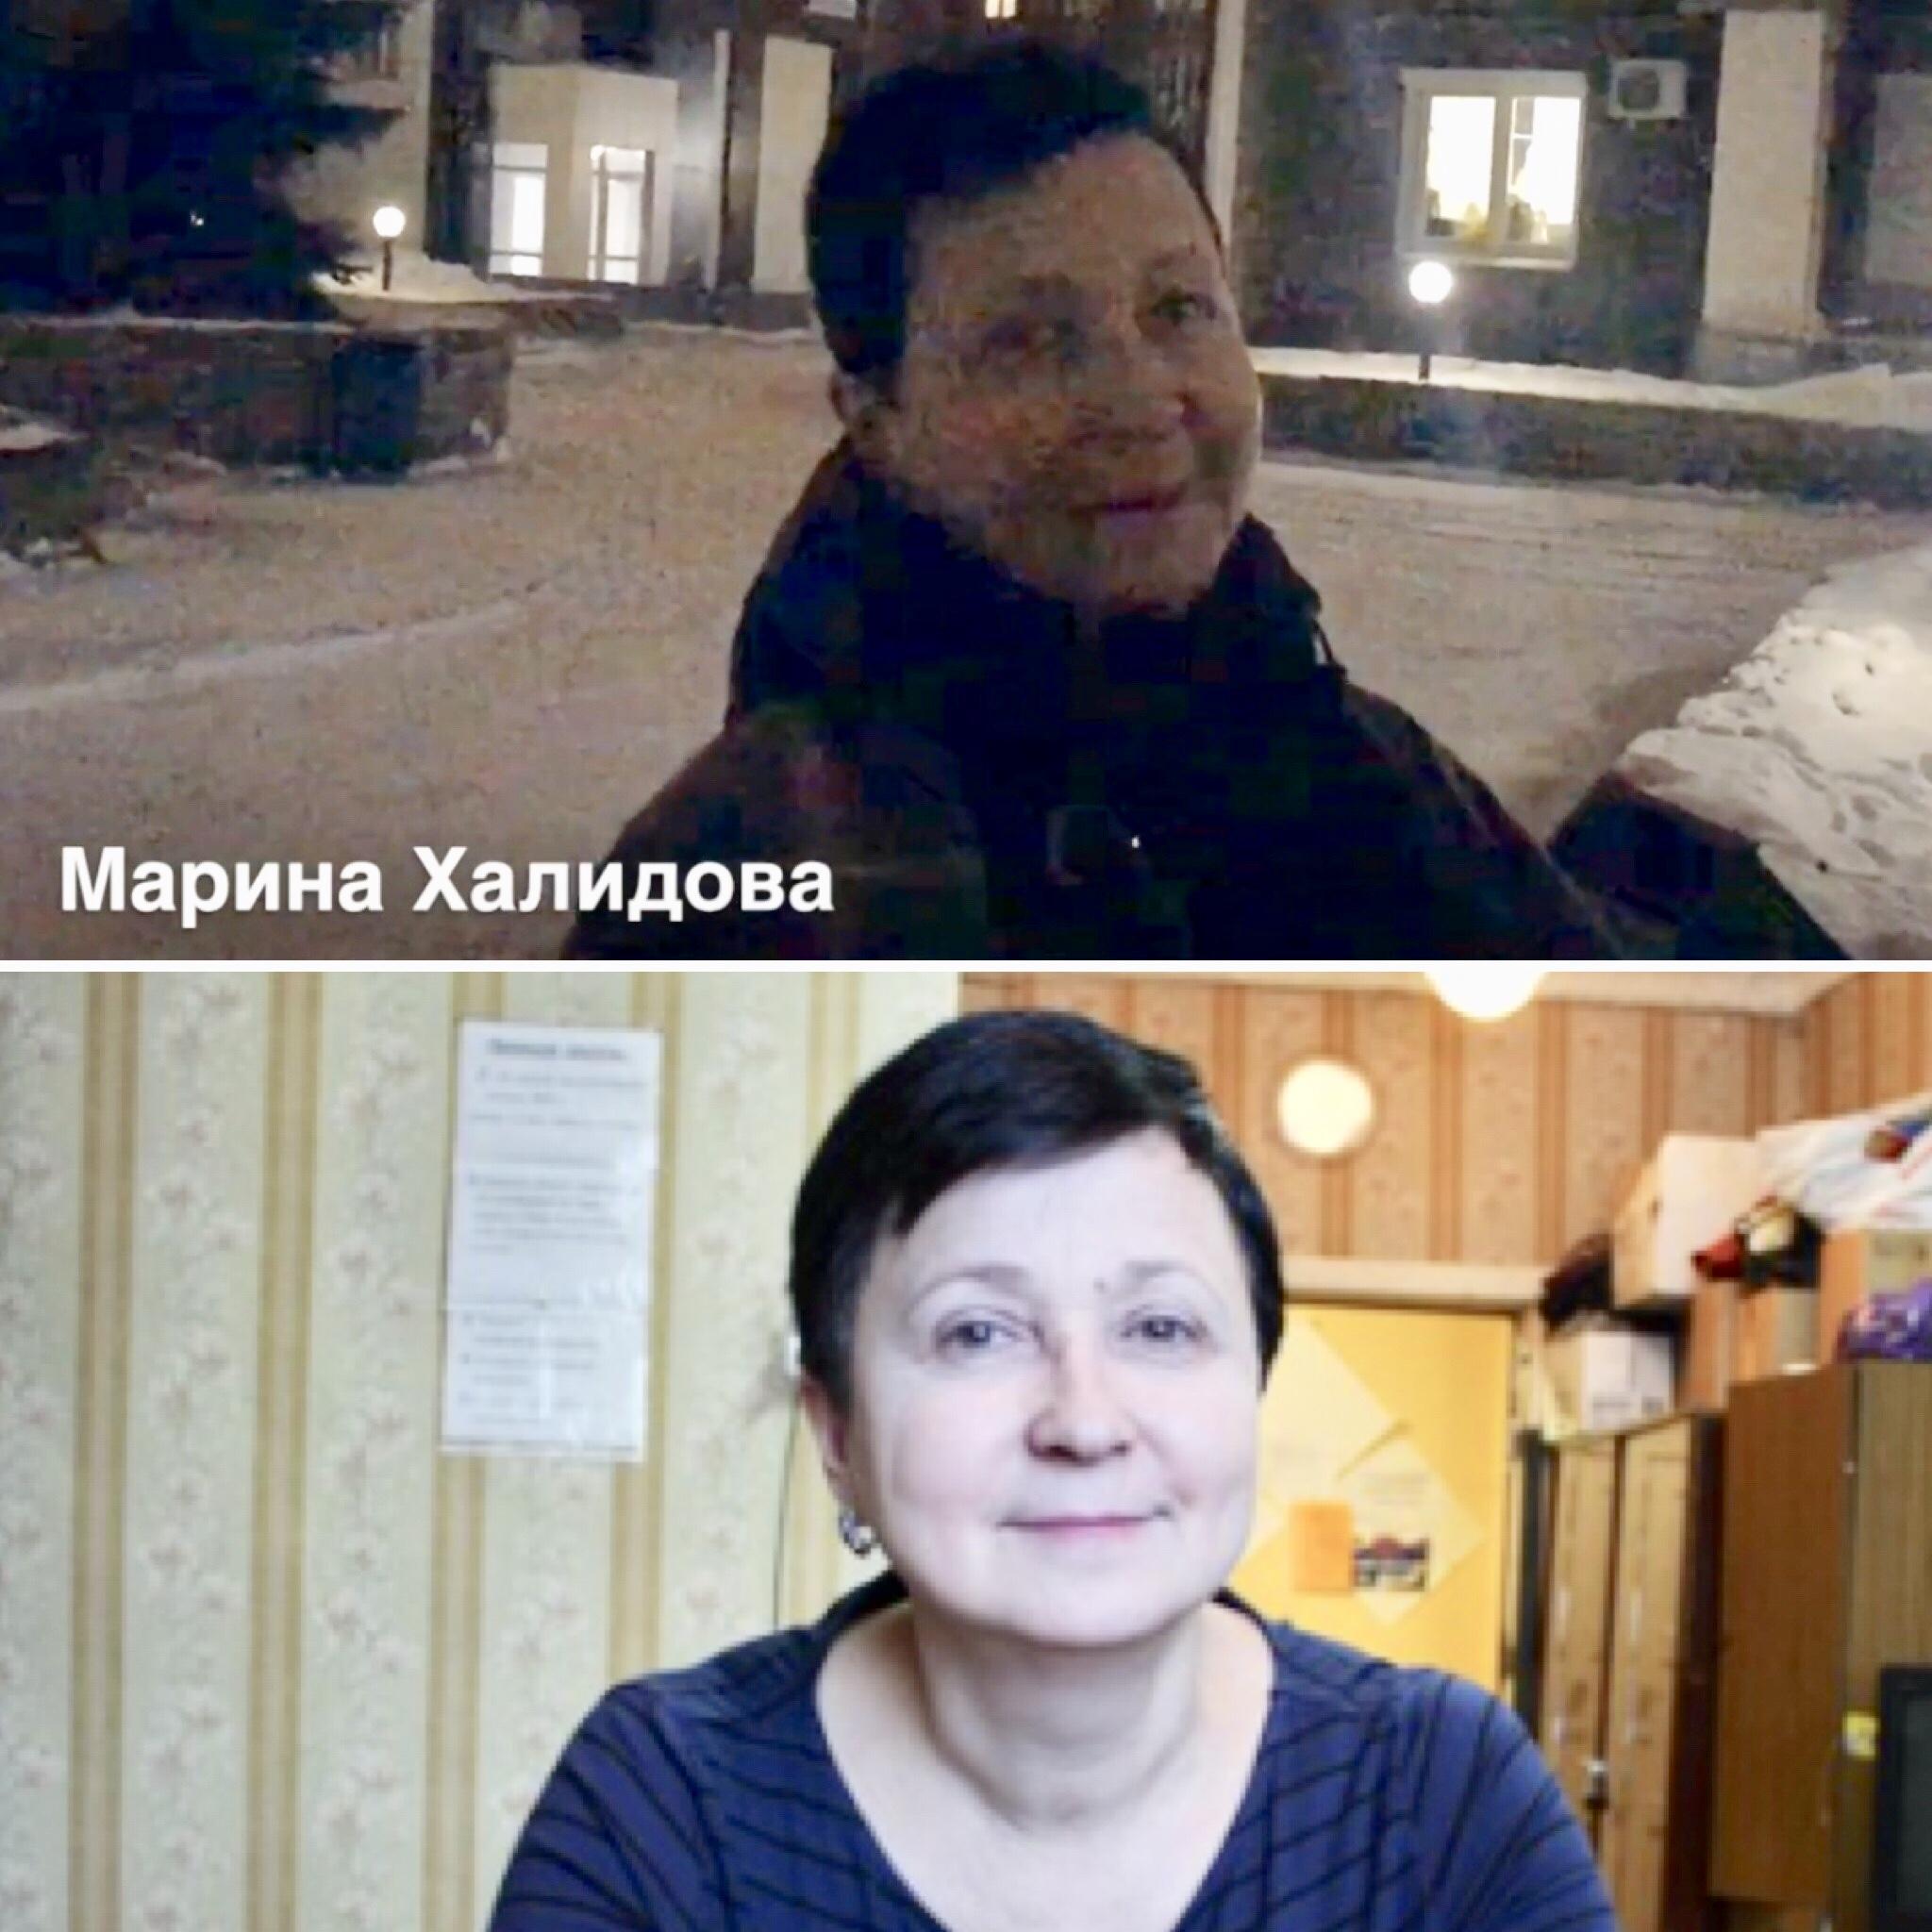 Марина Халидова